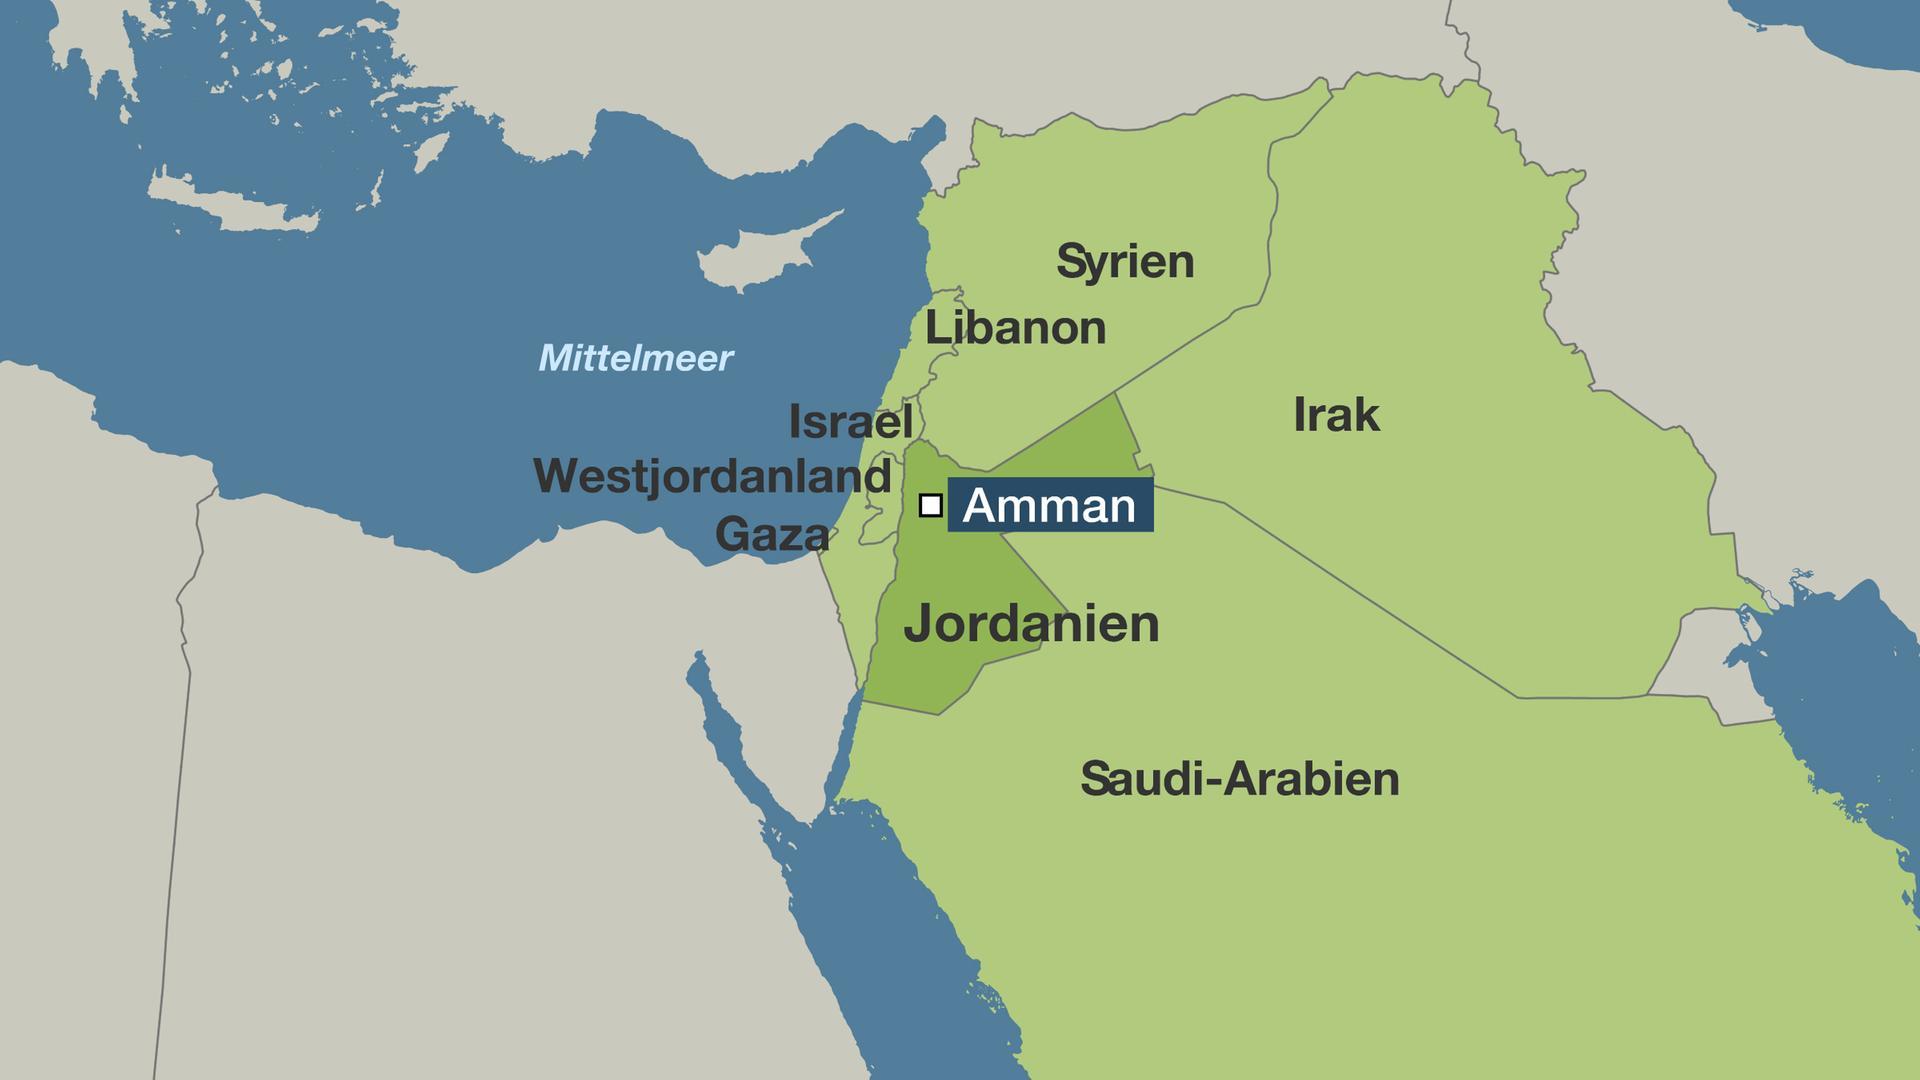 Jordanien Karte.Maas In Jordanien Von Konflikten Umzingelt Zdfmediathek